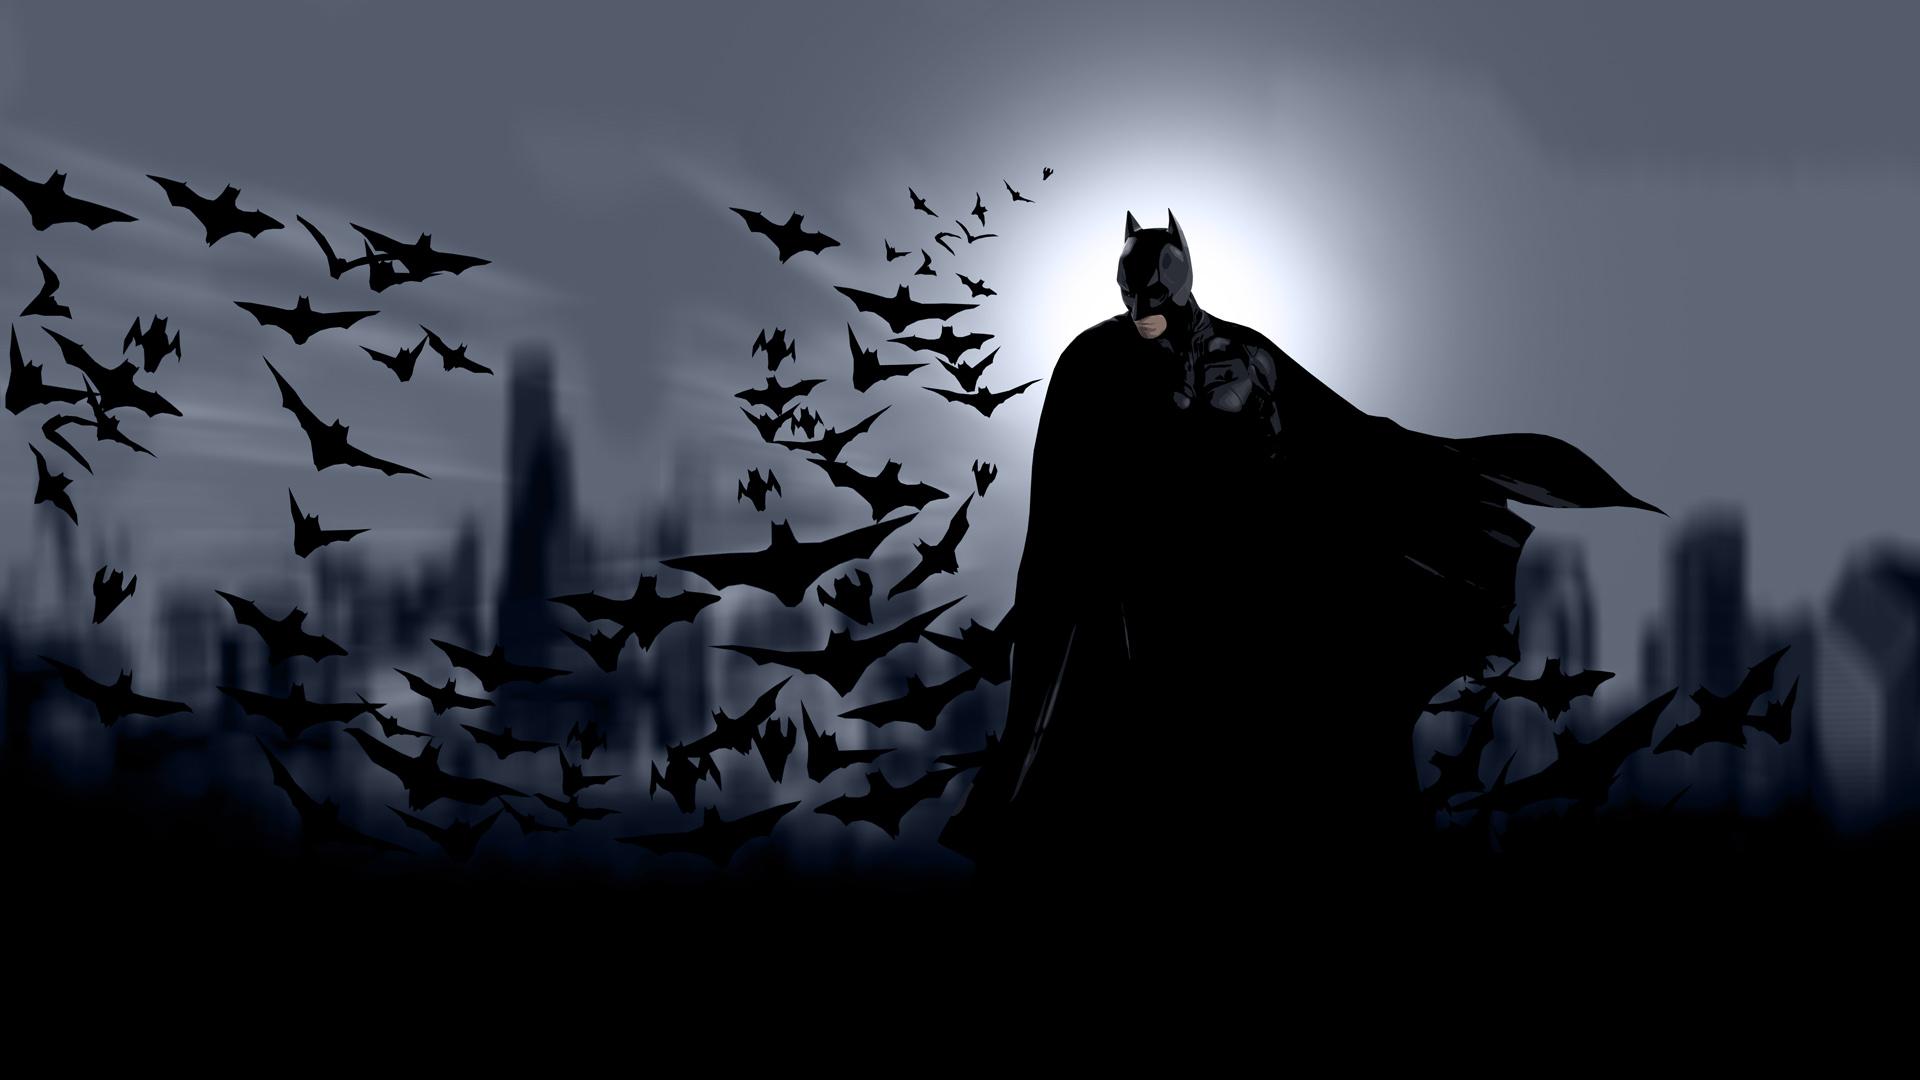 Batman Cool At The Night Wallpaper WallpaperLepi 1920x1080